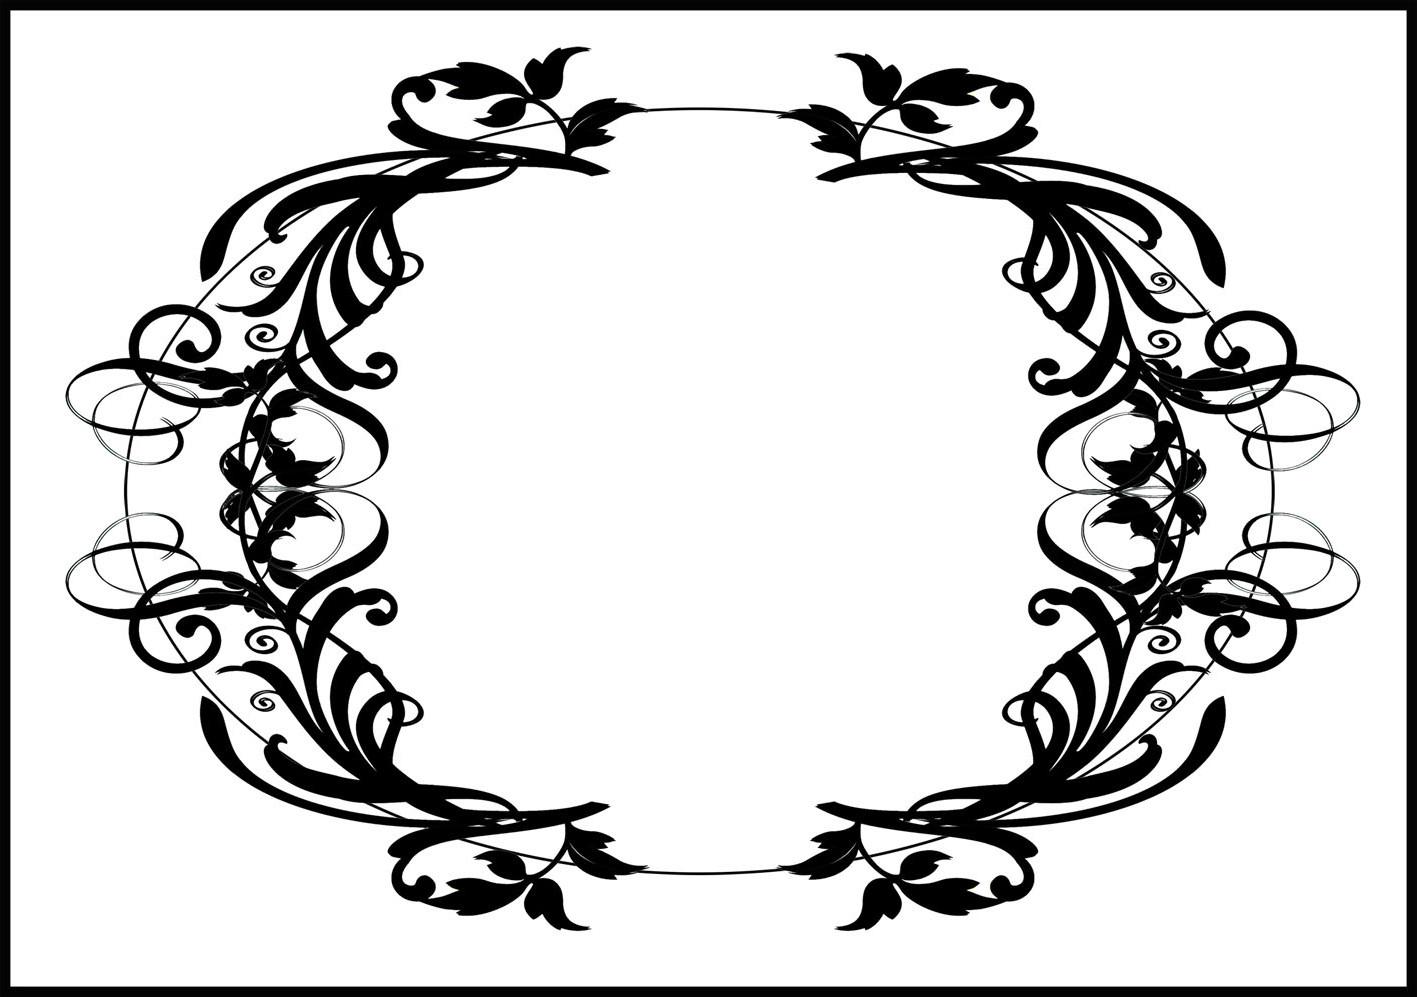 Black frame in oval shape